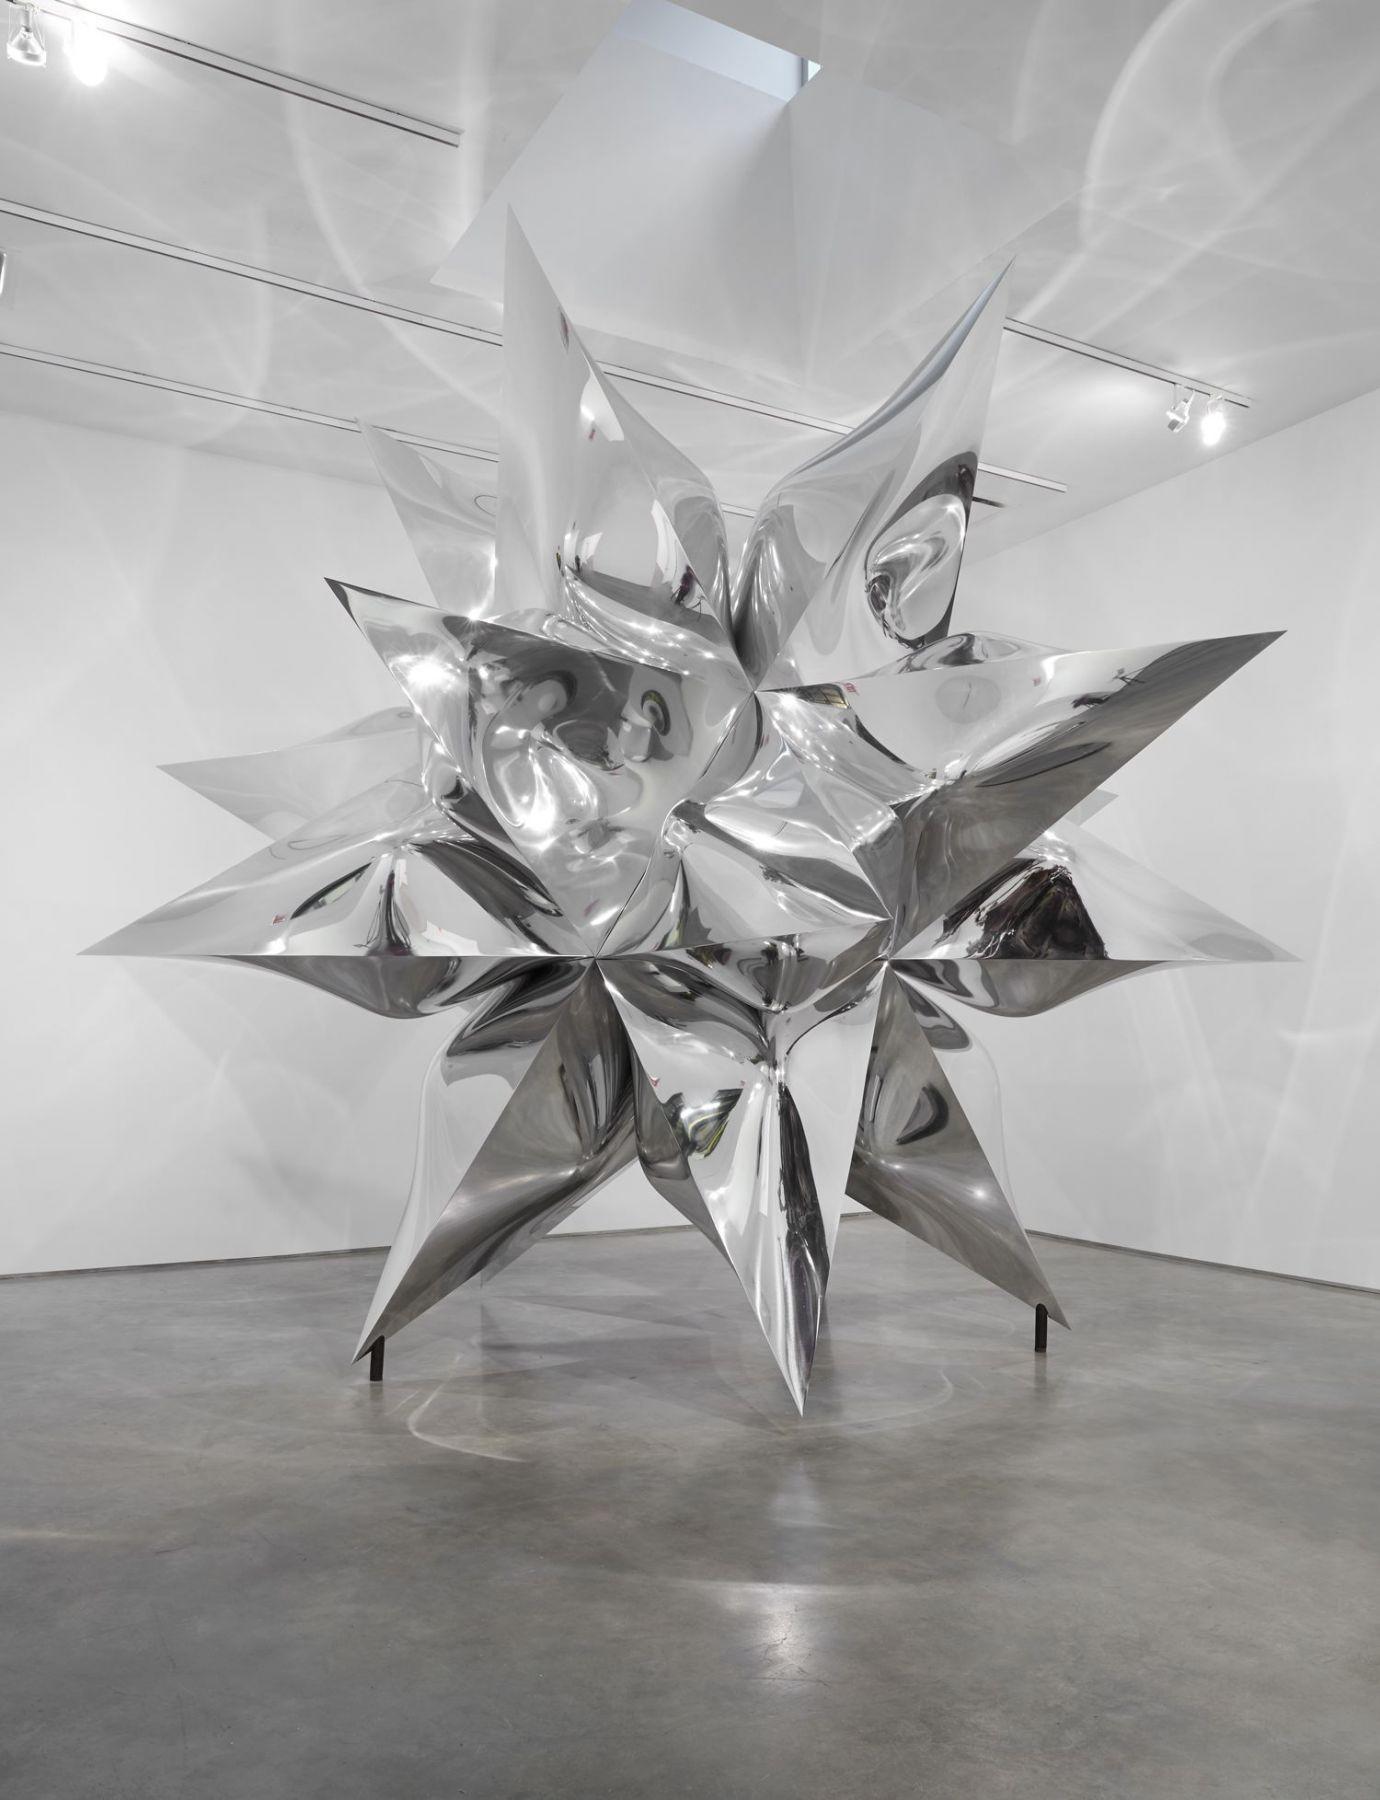 Puffed Star II, 2014, Polished aluminum